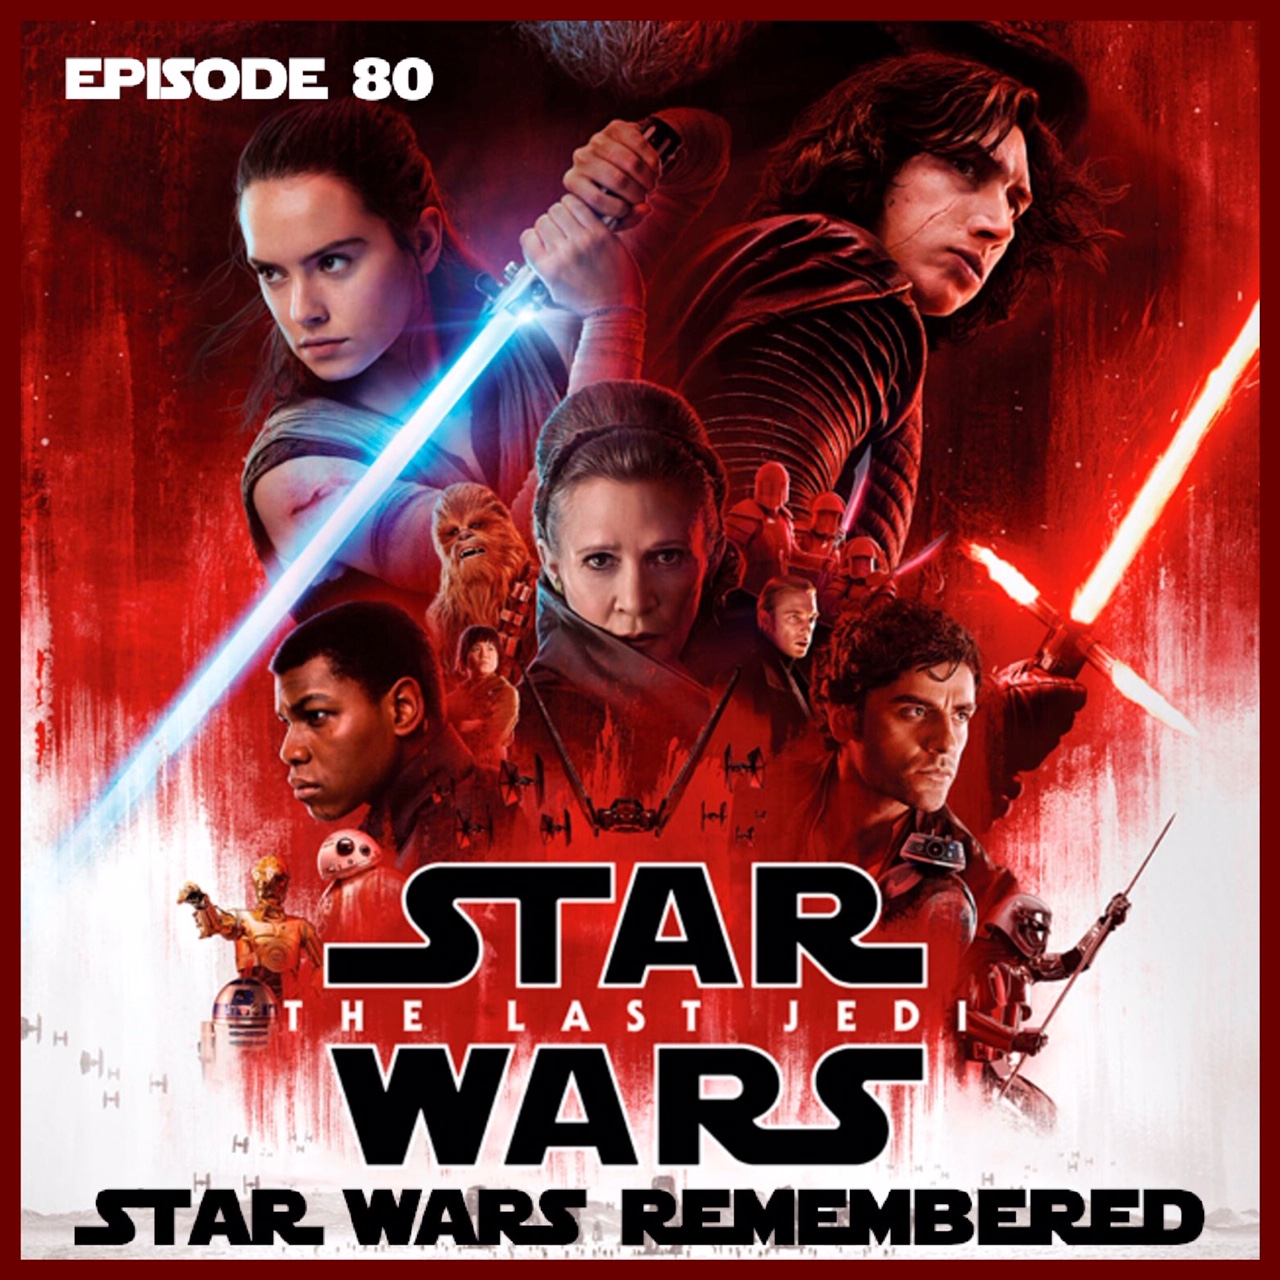 Star Wars Remembered - Episode VIII - The Last Jedi